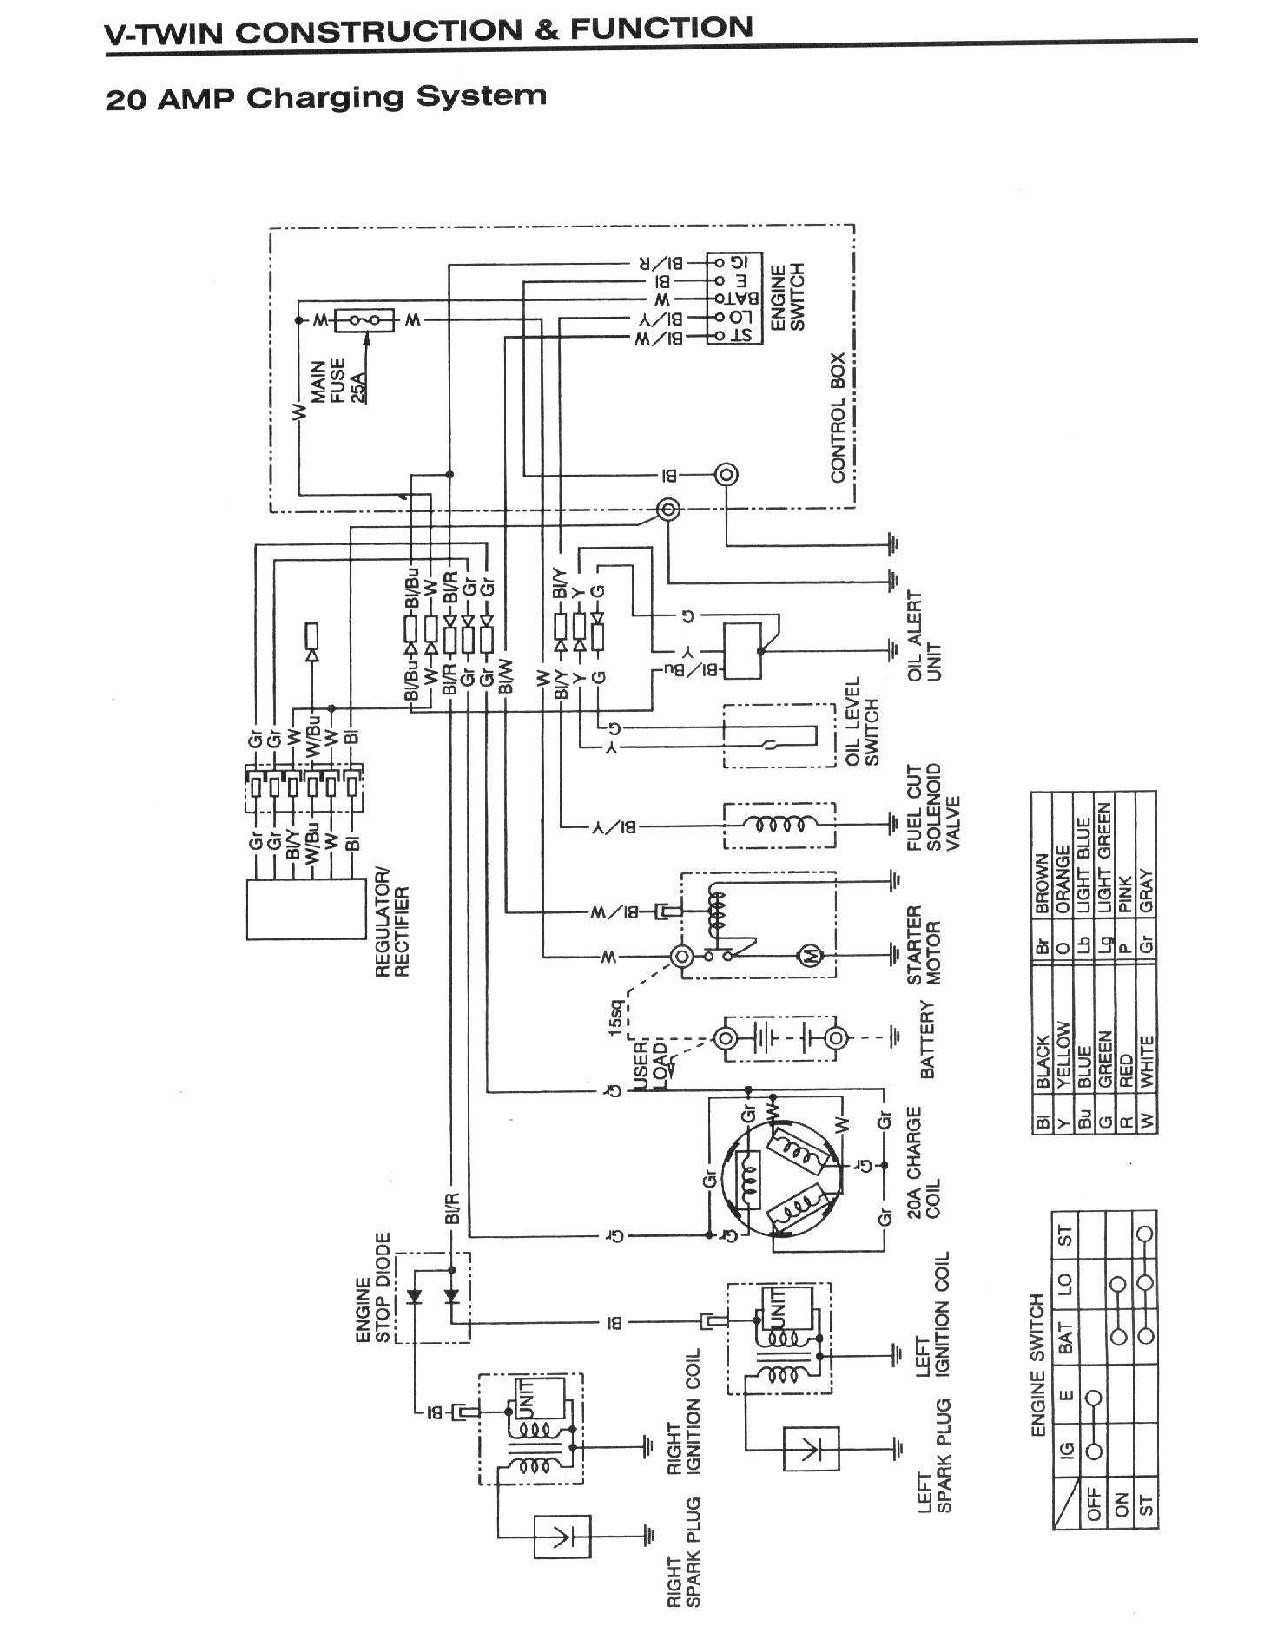 Predator 420cc Engine Wiring Diagram Dsl Wiring Basics Of Predator 420cc Engine Wiring Diagram